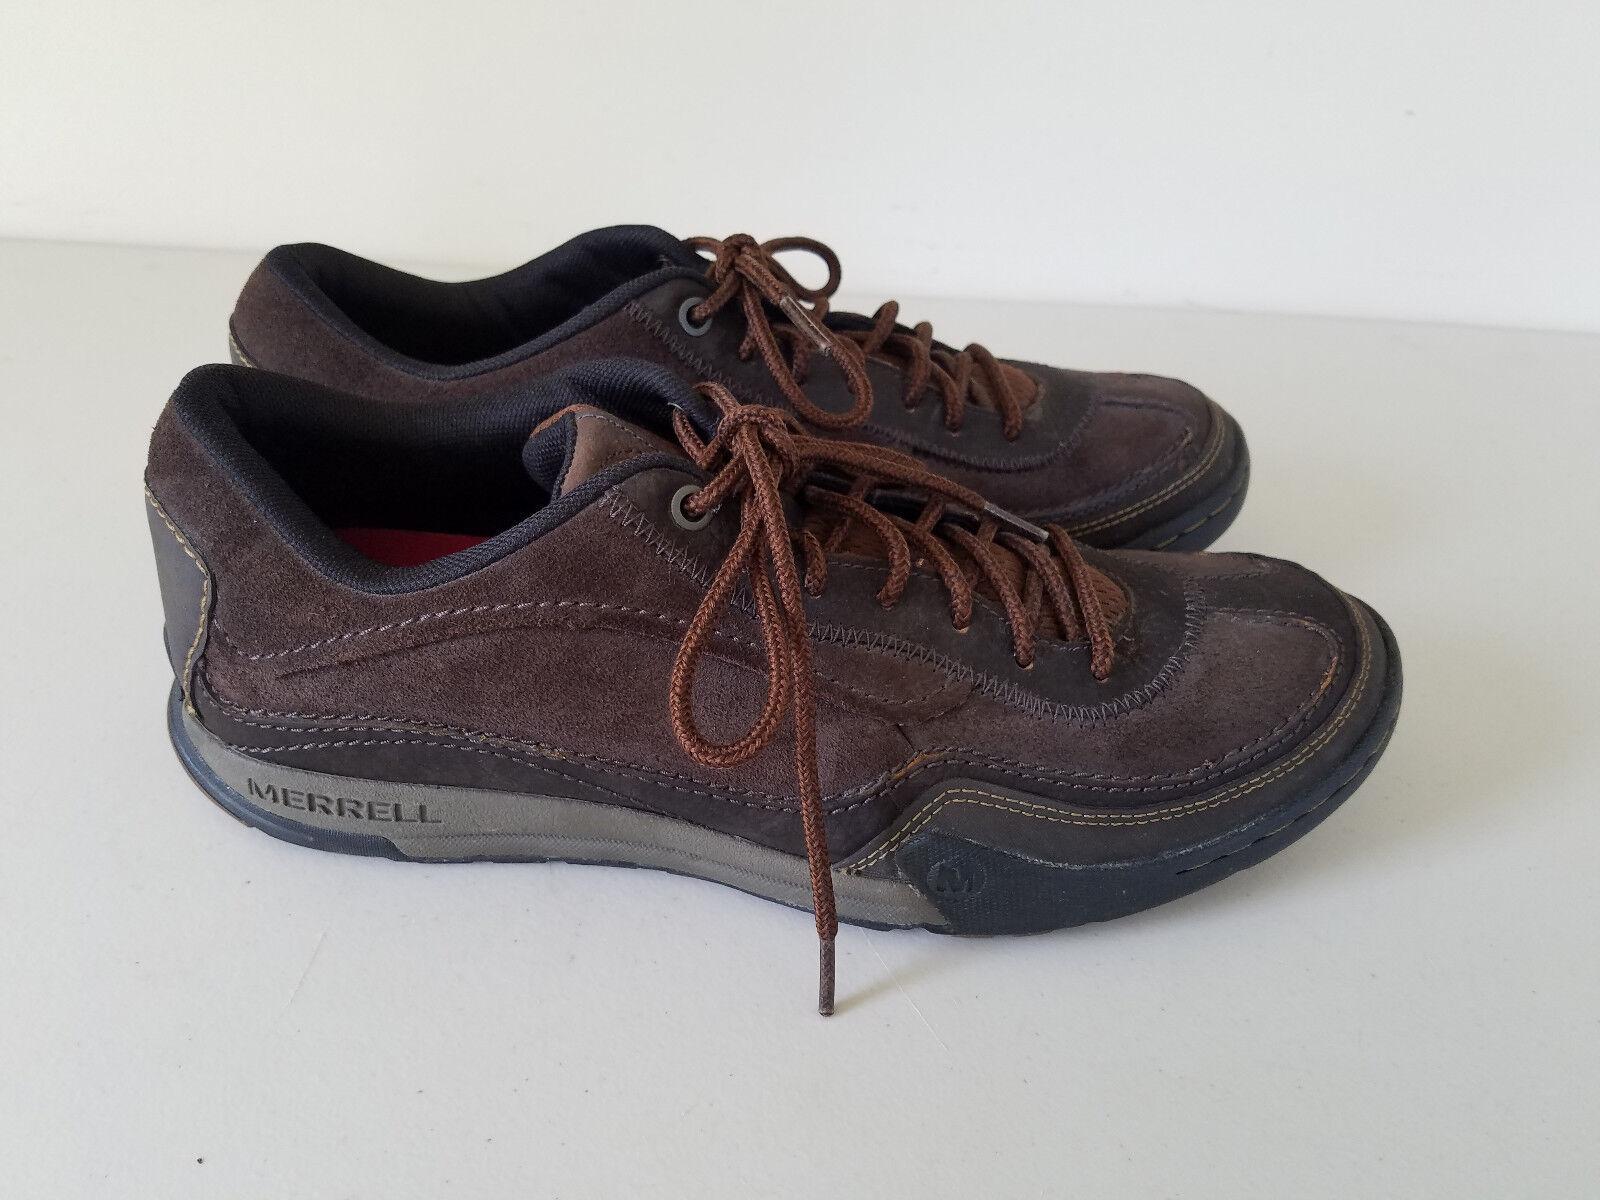 44855bdb1de Merrell Mountain Diggs Dark Earth Earth Earth Leather Shoes Men s 44 US Shoe  Size 10 J39465 53ee2a